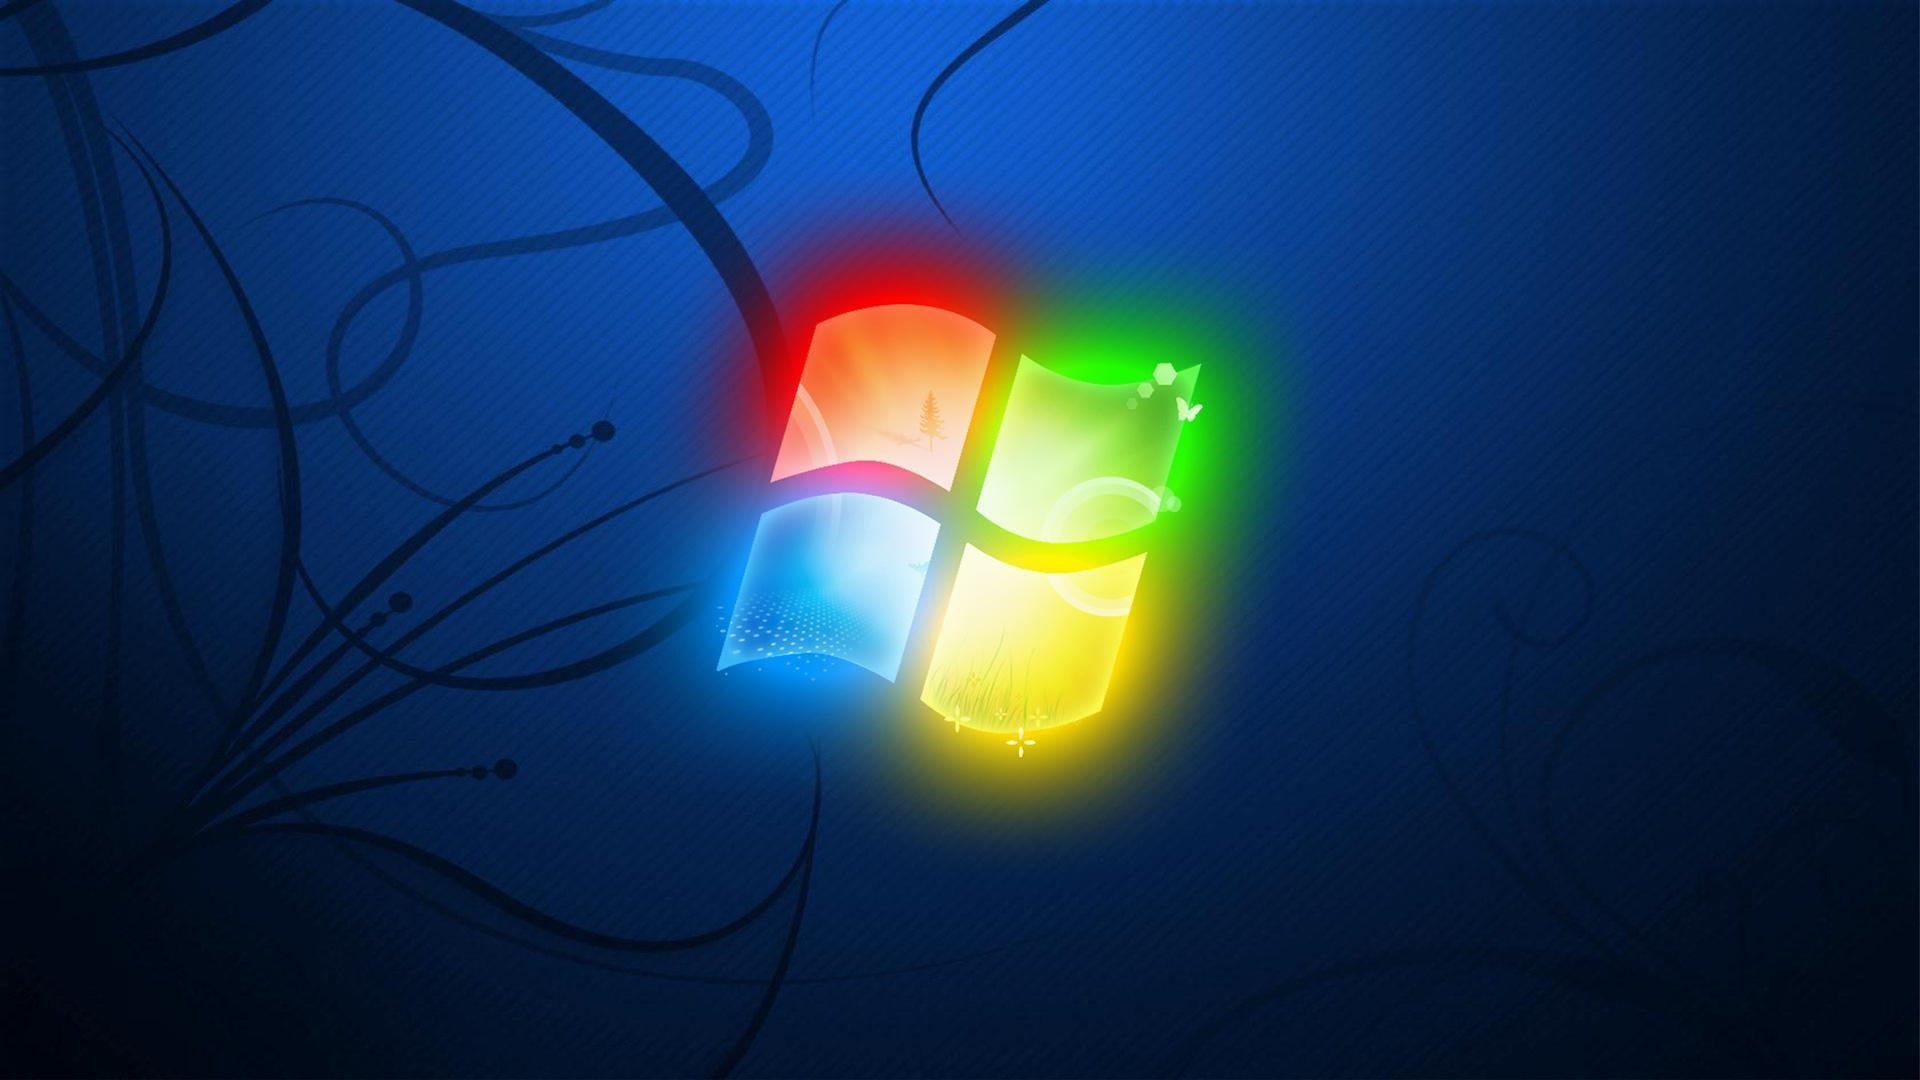 hd windows wallpaper (81+ images)